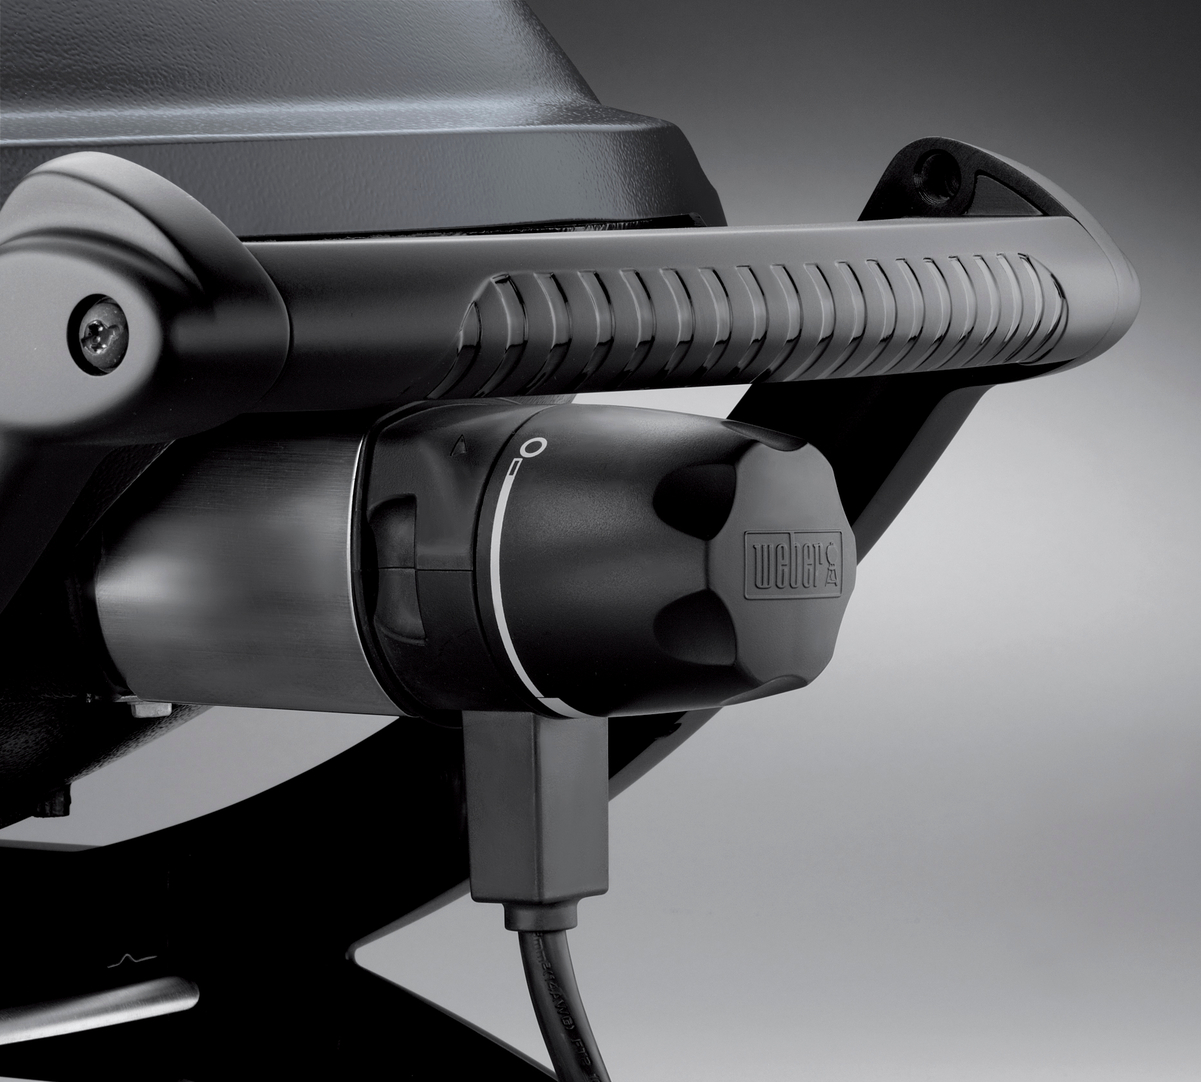 Kontrolleinheit Q 1400-2400 Elektrogrills